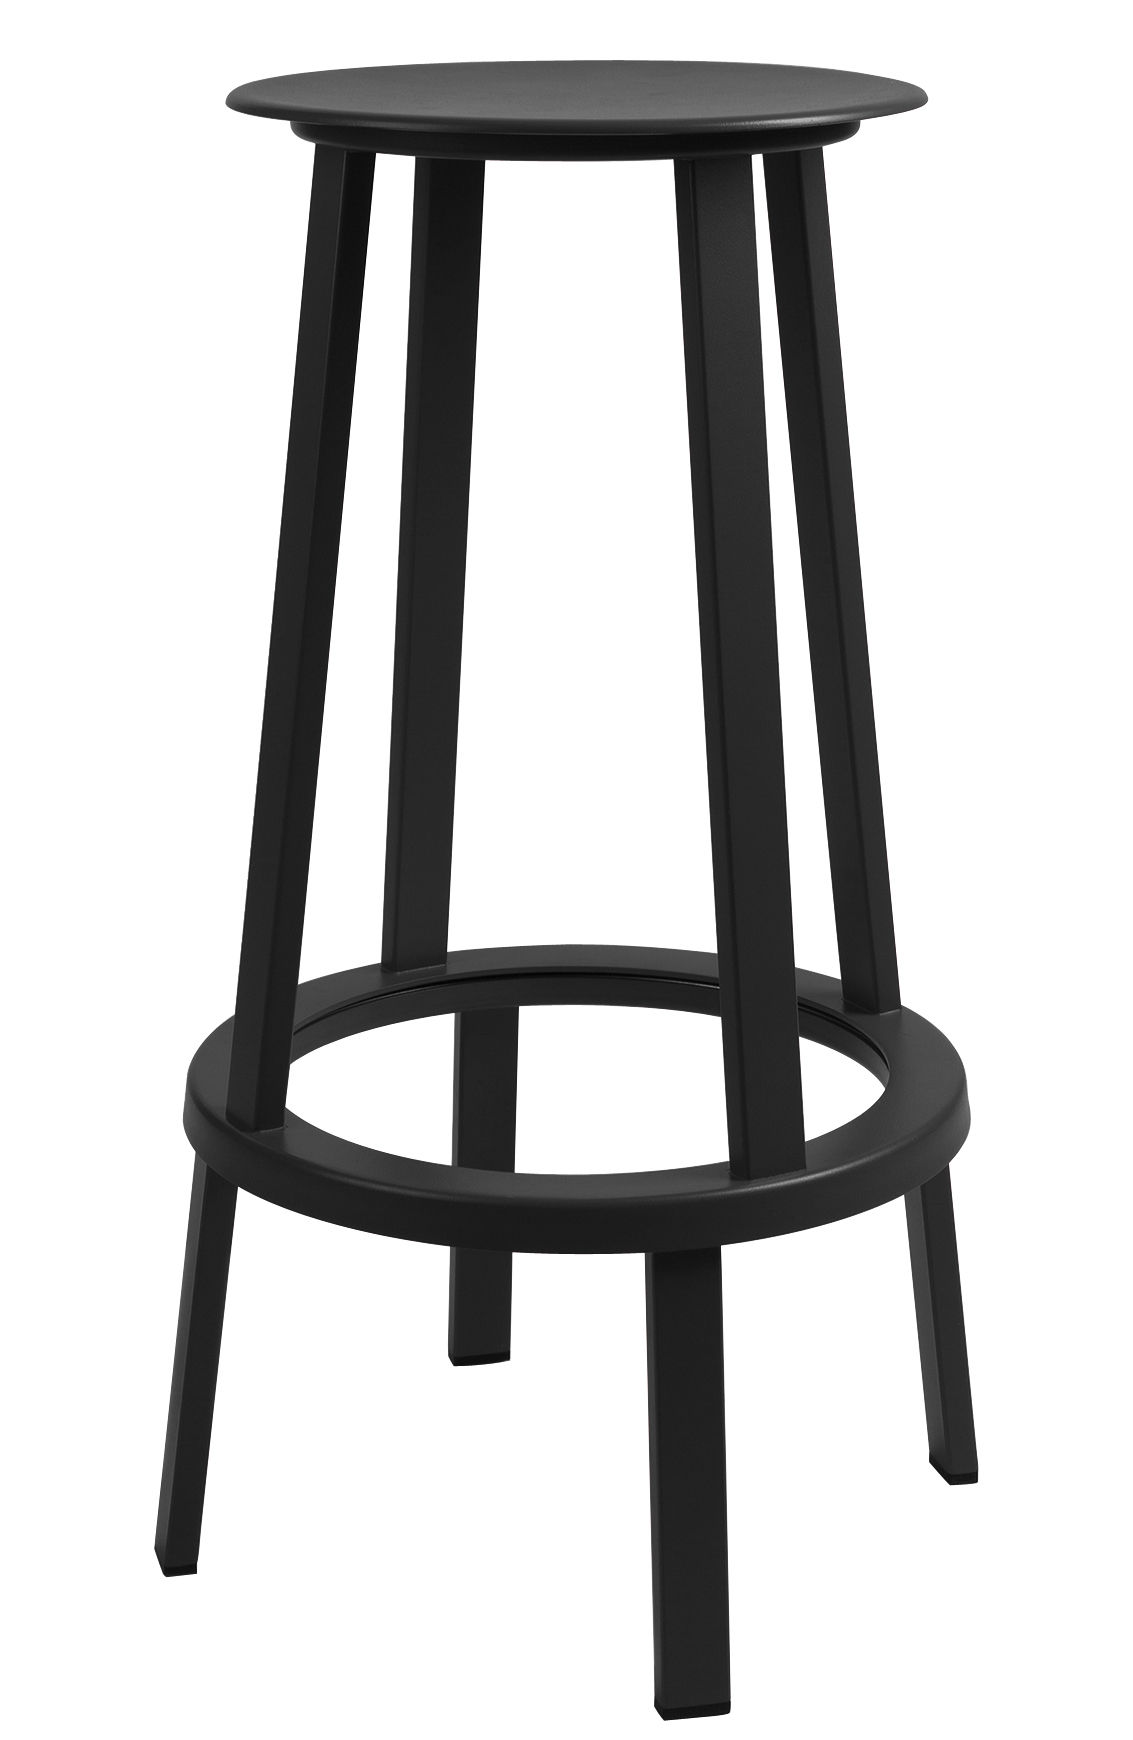 tabouret haut pivotant revolver h 75 cm m tal noir hay. Black Bedroom Furniture Sets. Home Design Ideas